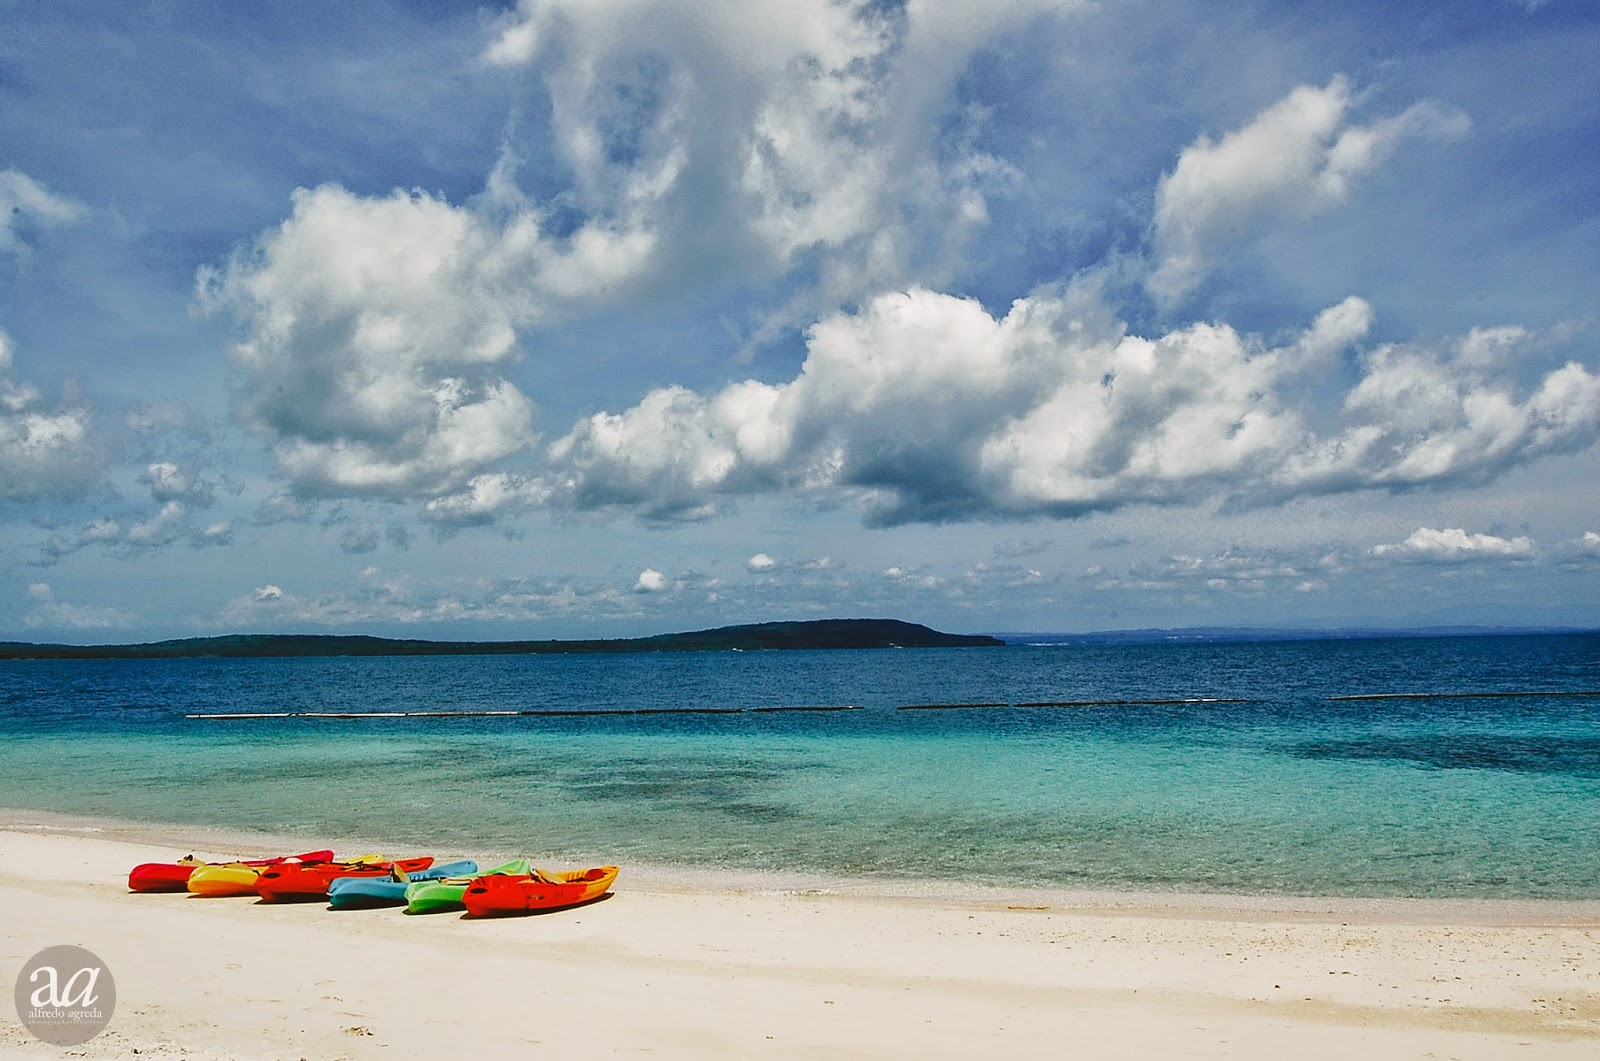 The Shore at The Island Buenavista